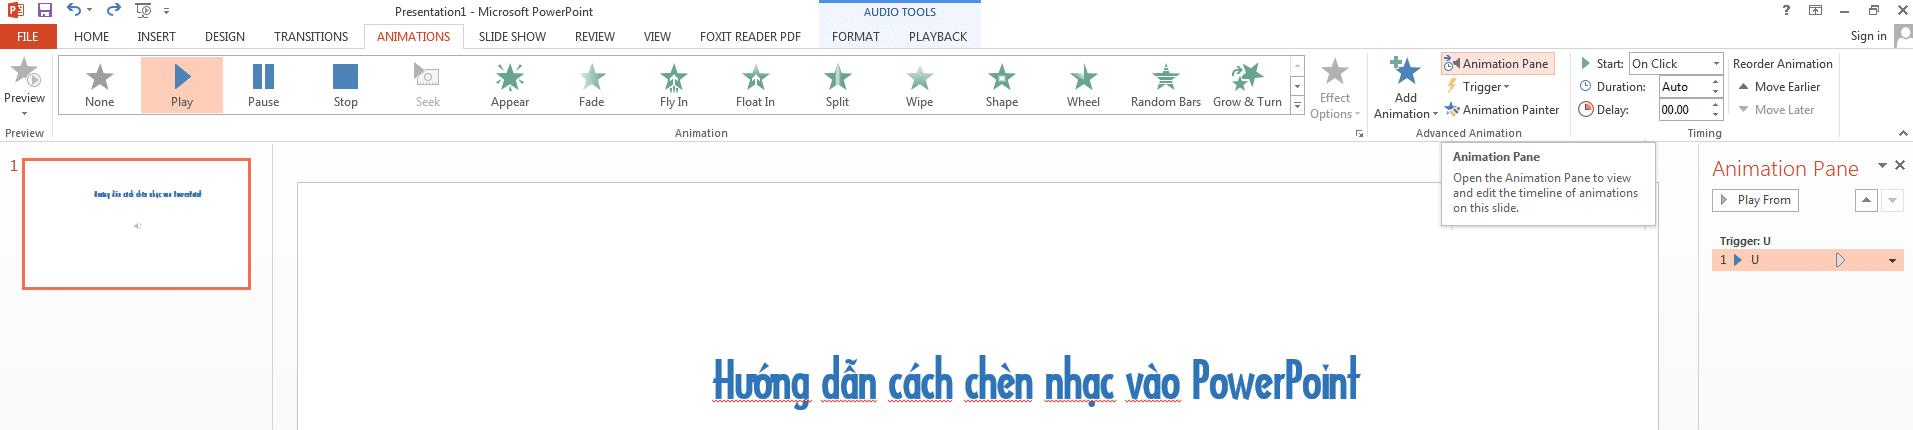 cach-chen-nhac-vao-powerpoint